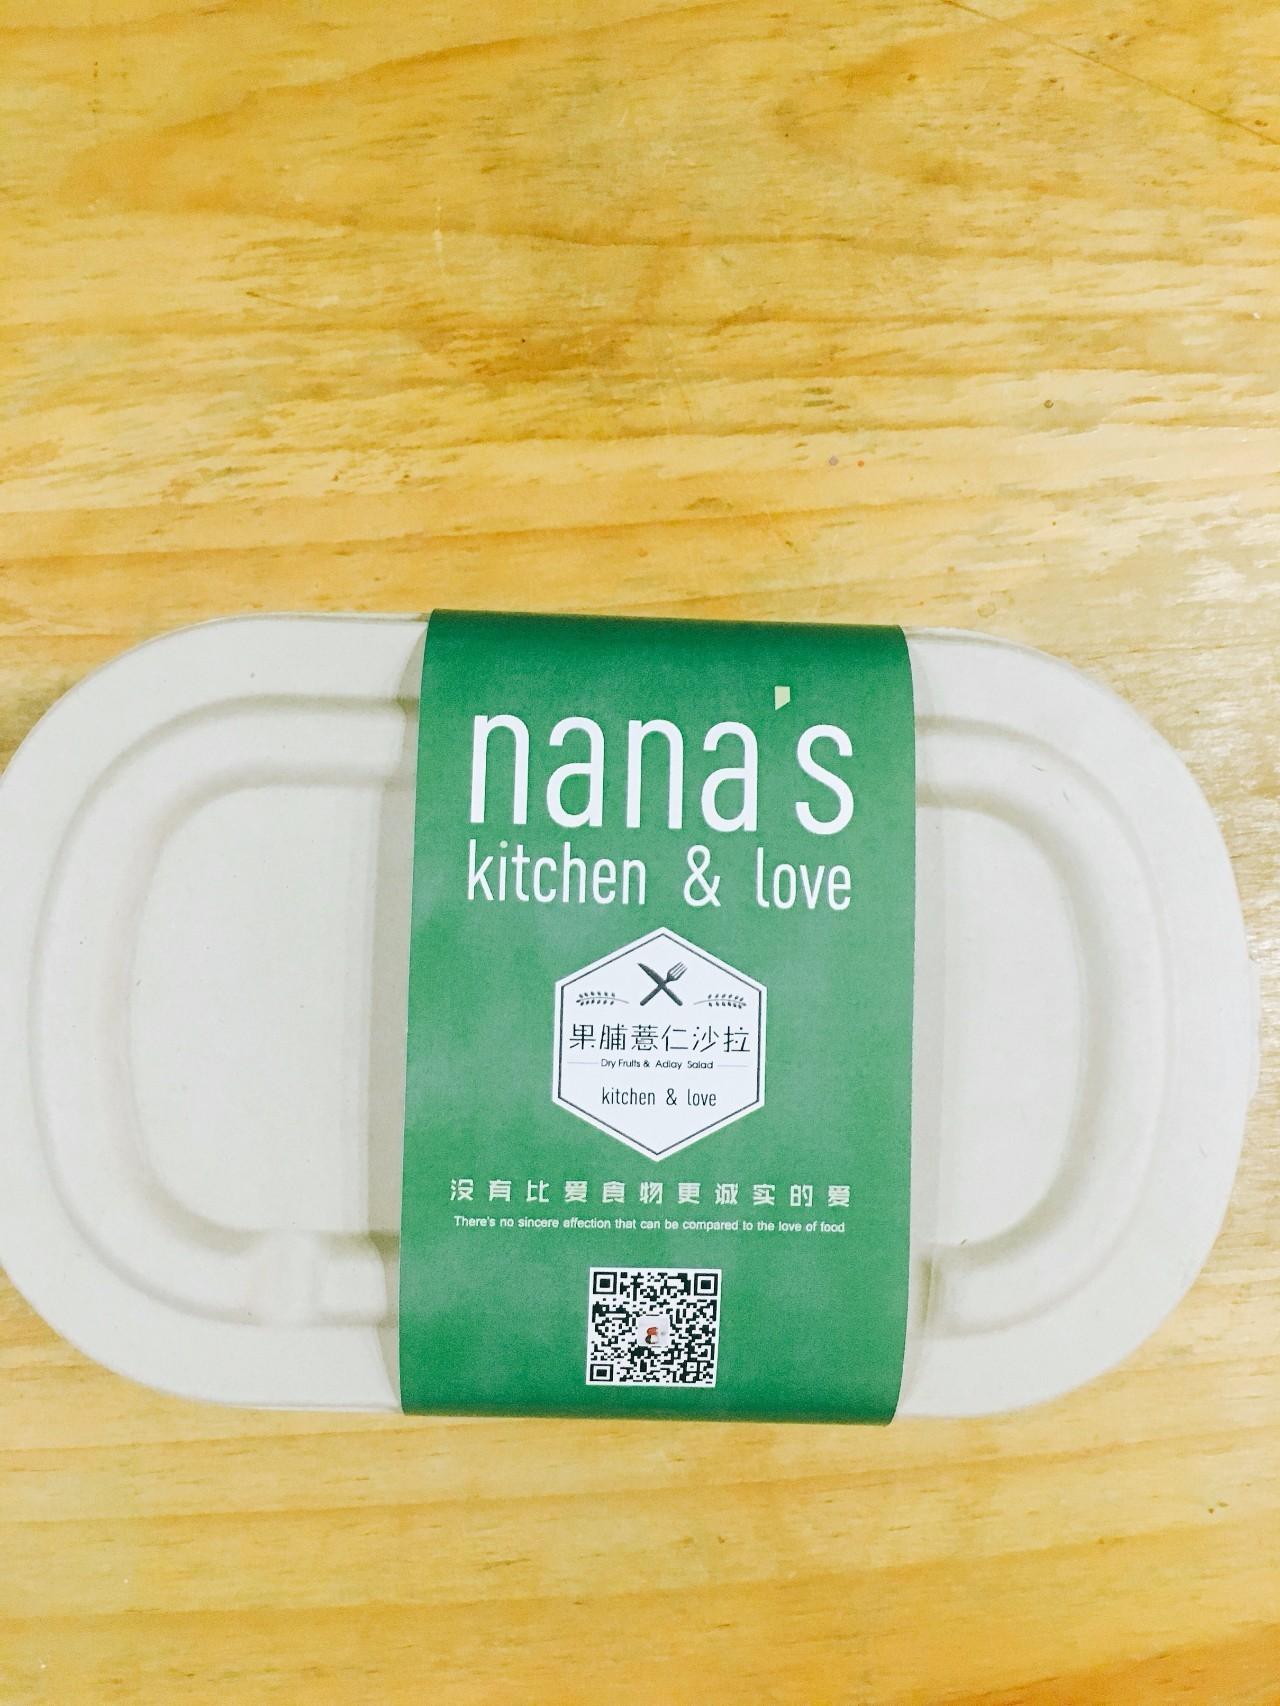 the honest kitchen outdoor frame kit 厨房的便当 没有比爱食物更诚实的爱 厨房的便当是长这样的 设计是小正帮忙设计的 还有爱德华 我最终选了绿色的包装 它很适合厨房 也很适合这个春天 菜是yvonne帮忙拍的 谢谢你 yvonne